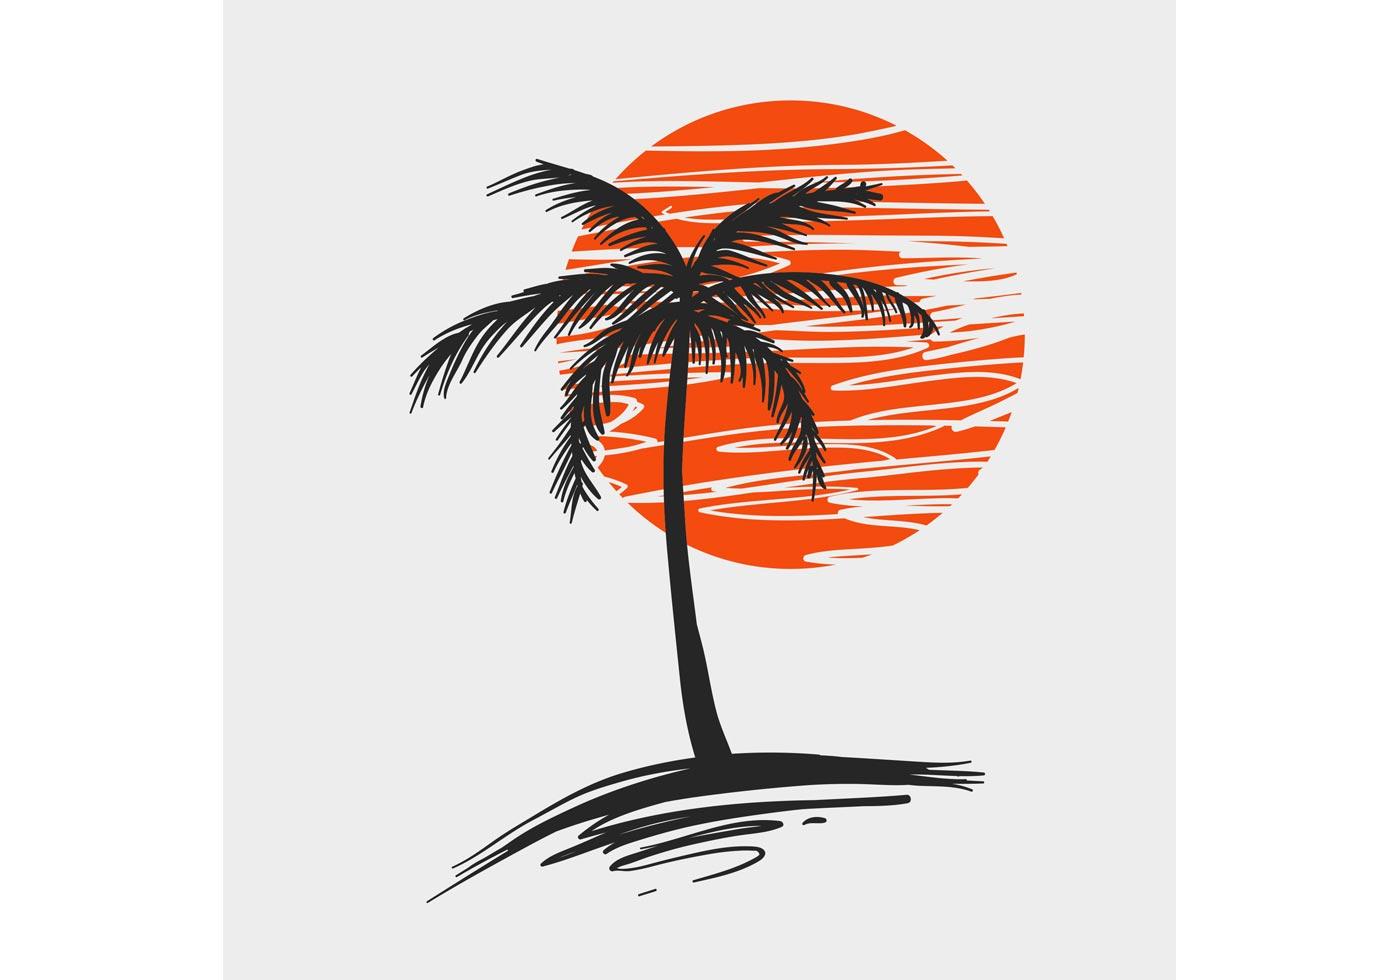 1400x980 6,000 Free Palm Tree Vector Art Files Amp Illustrations